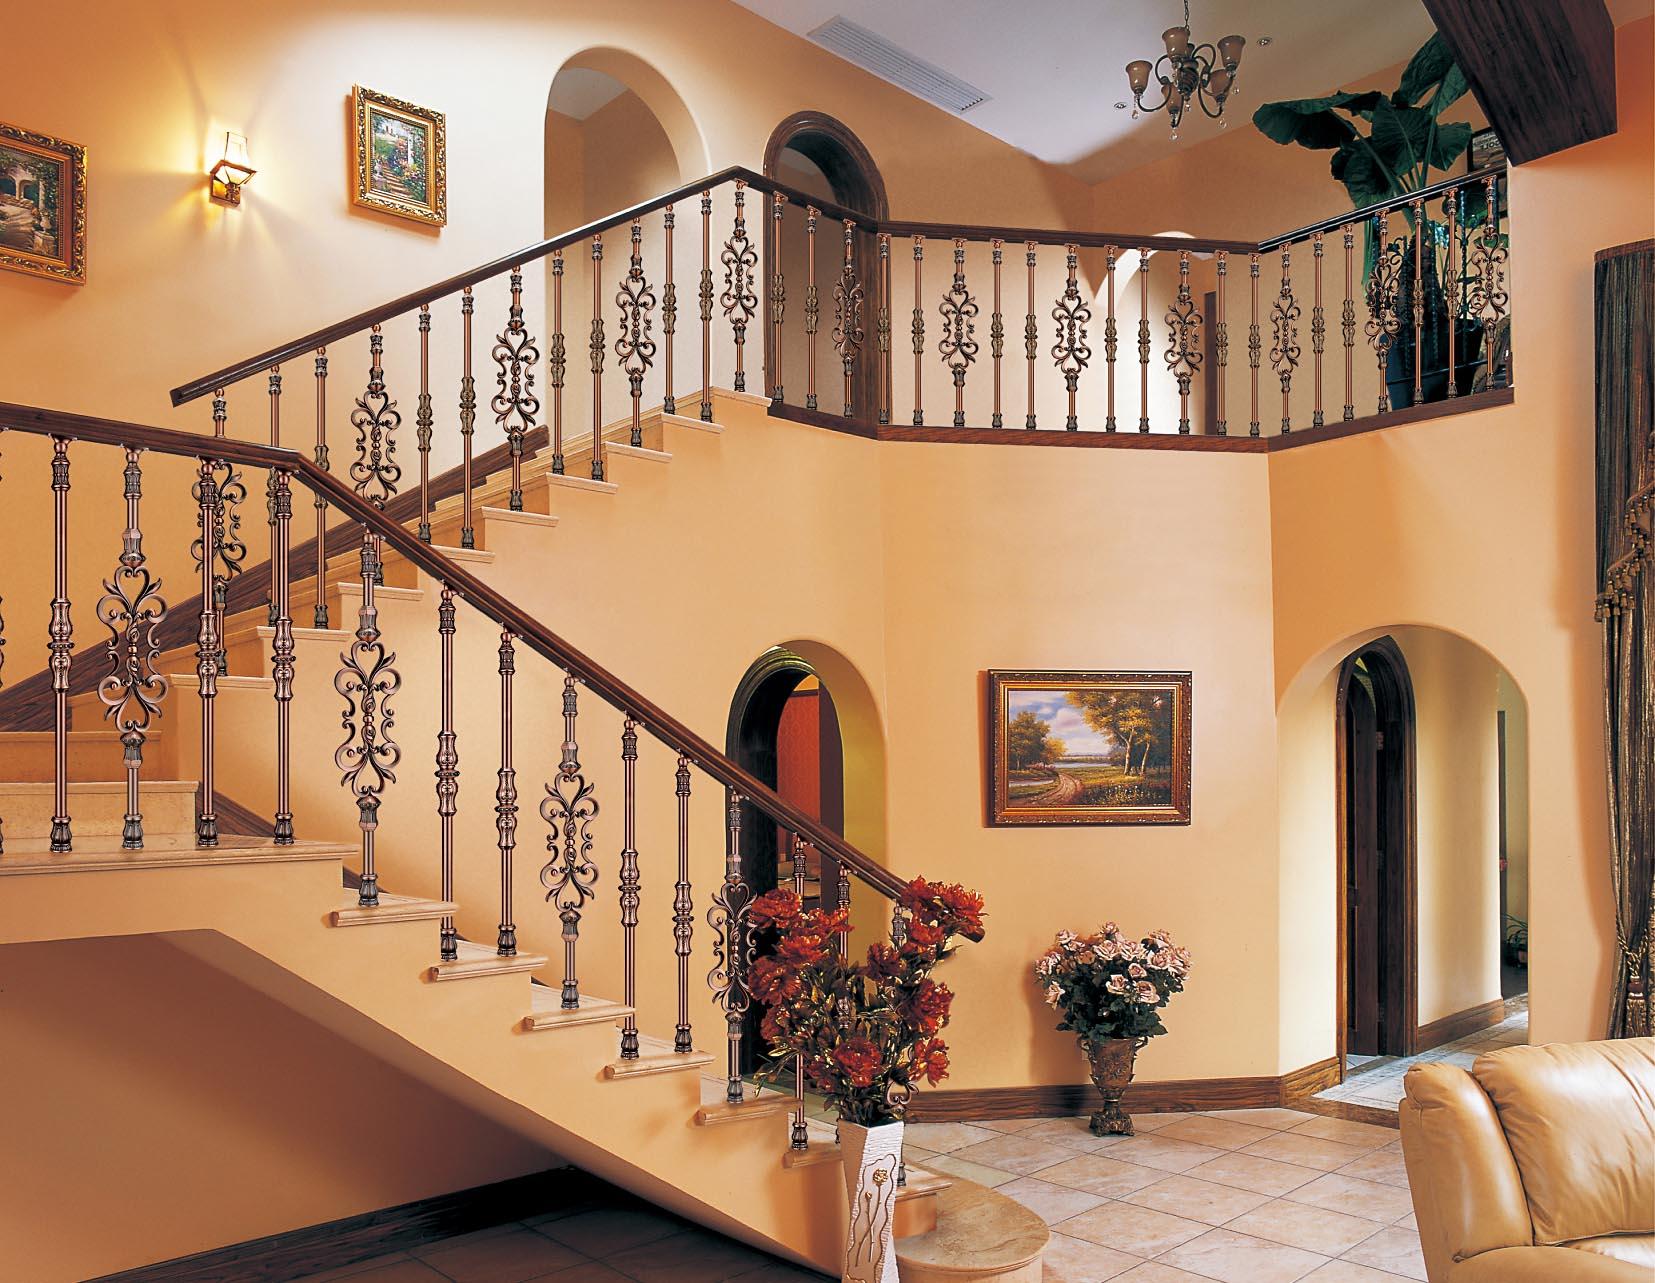 B009南苑时代/楼梯护栏/金属楼梯/复式豪宅楼梯护栏